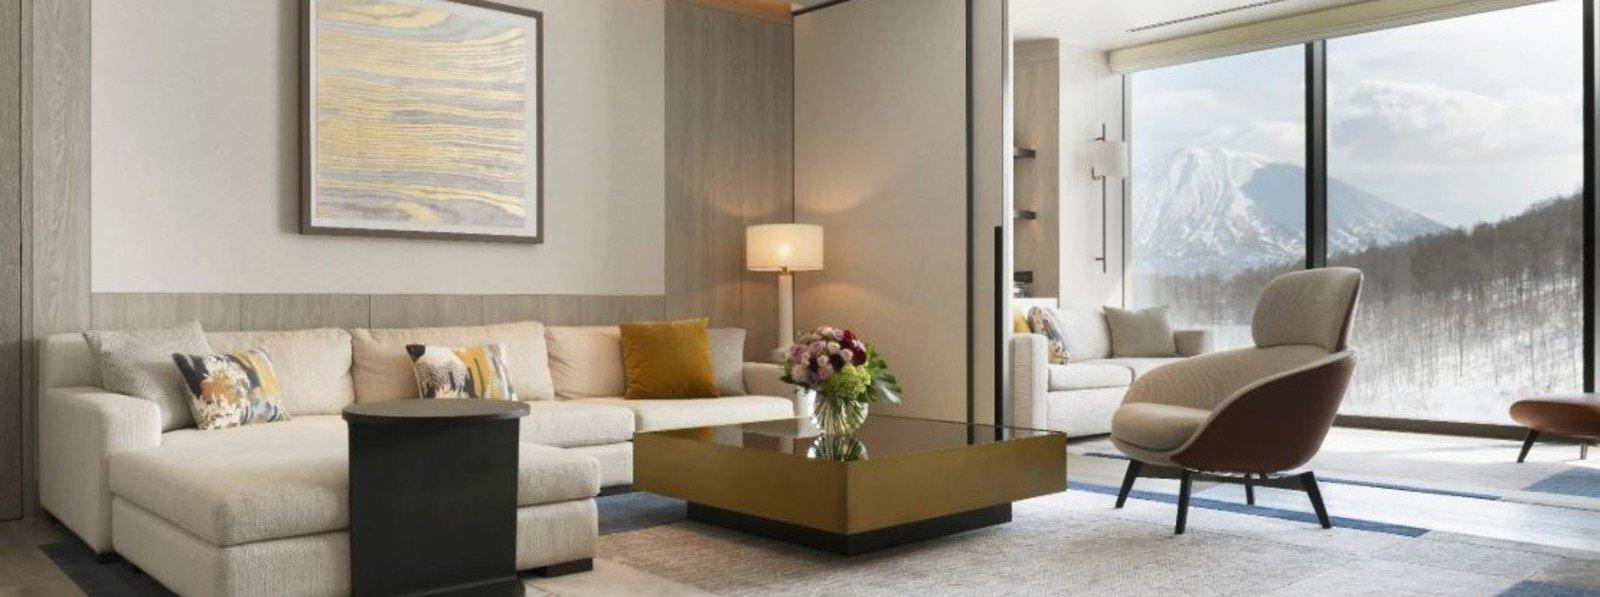 park hyatt niseko hanazono accommodation suite living room